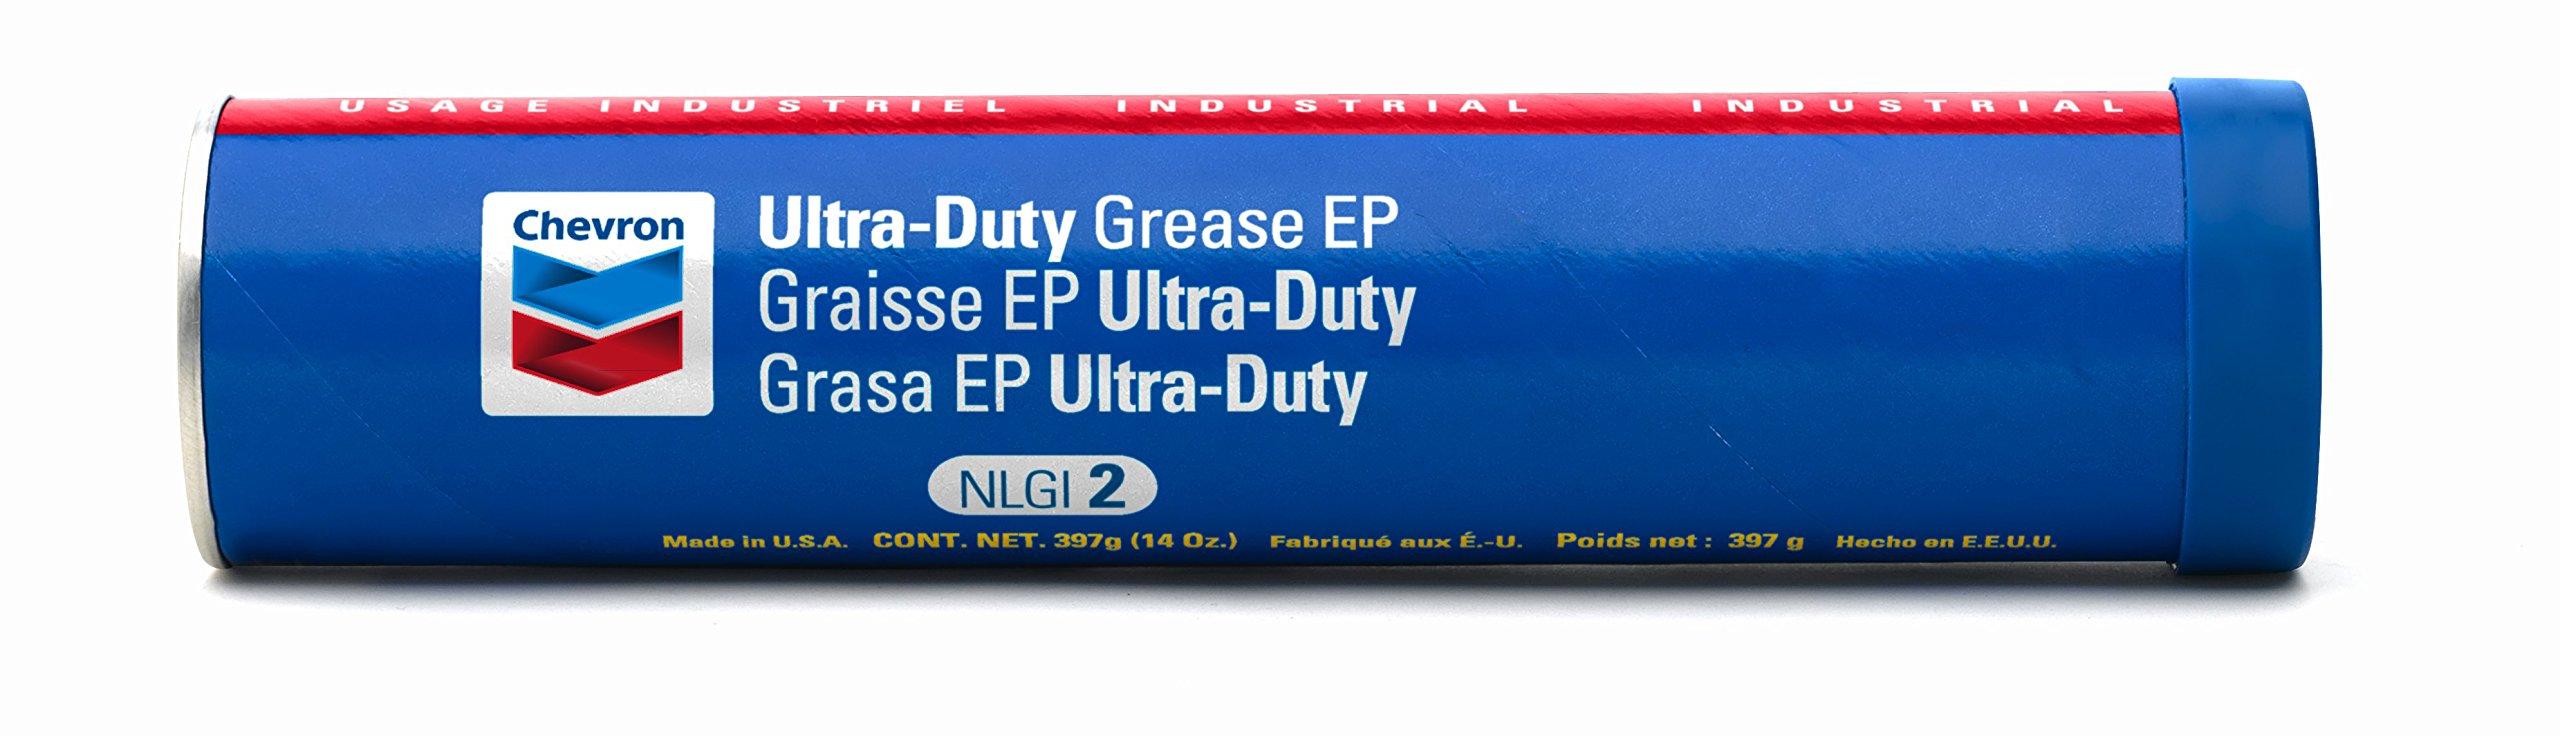 Chevron Ultra-Duty Grease EP 2